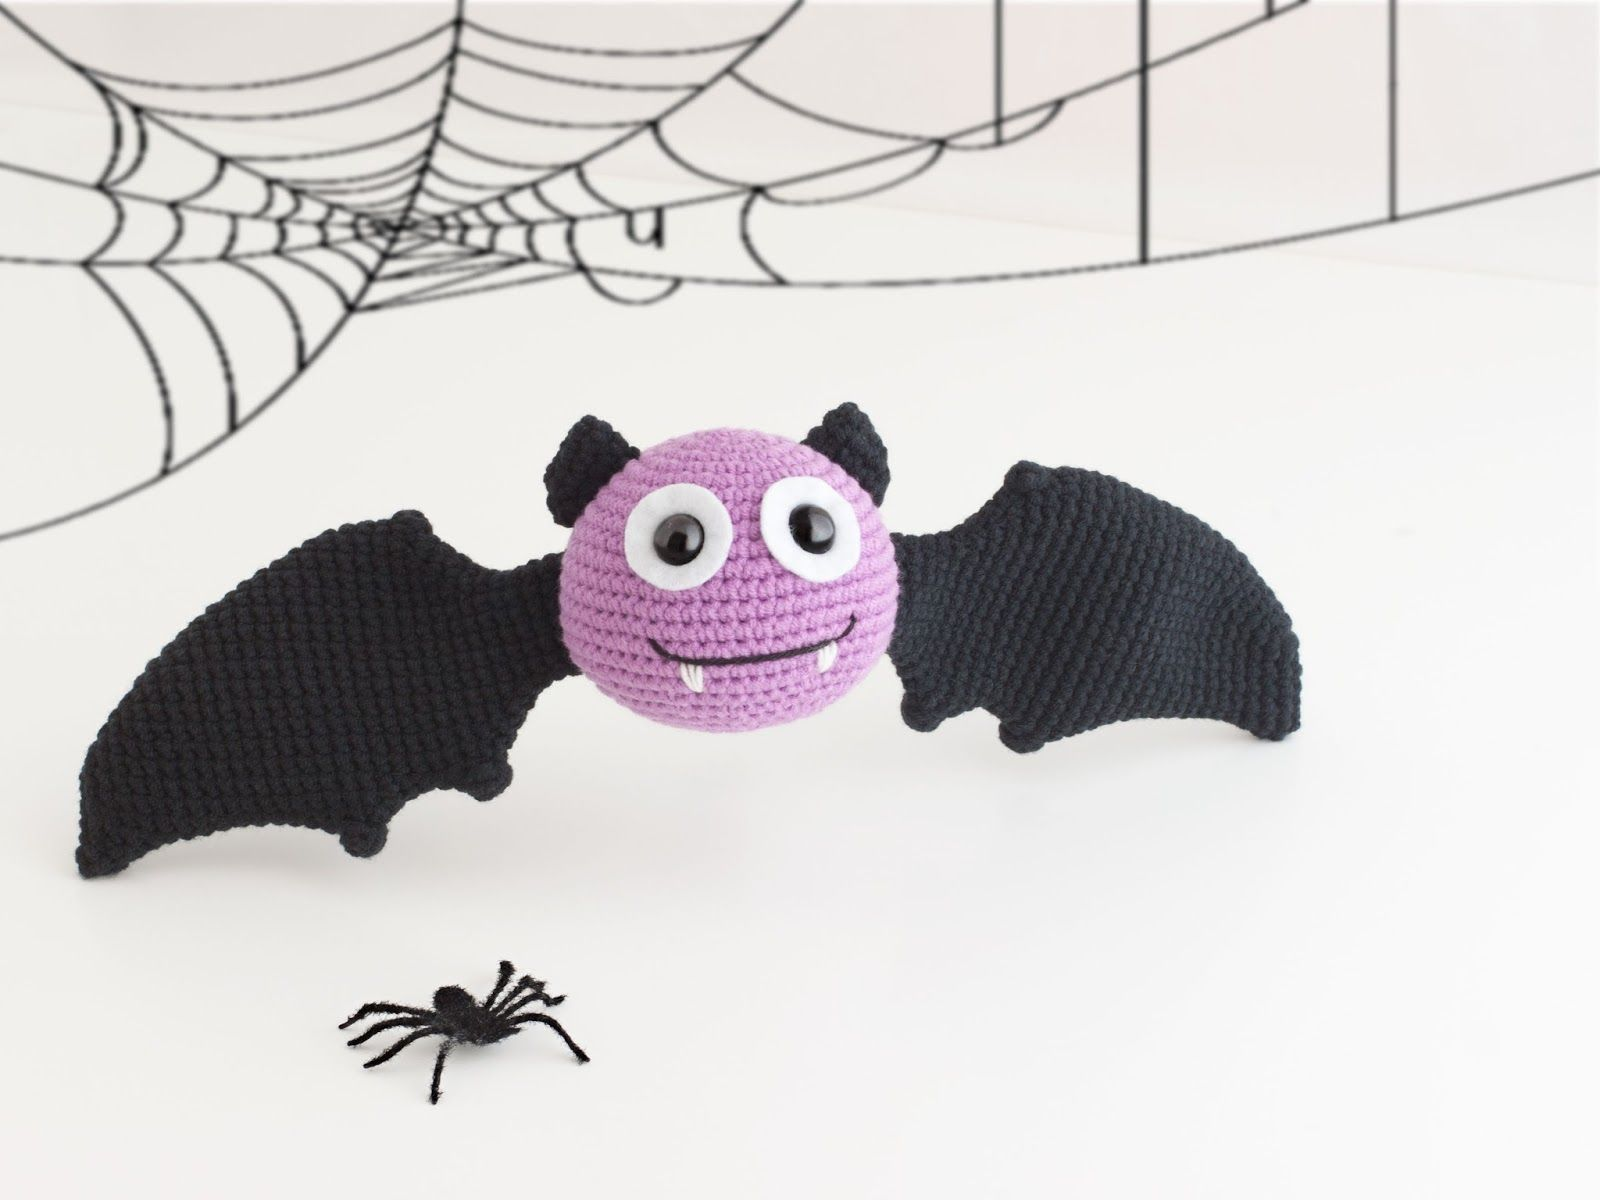 Amigurumi Halloween Free : Amigurumi bat free crochet pattern tutorial in english